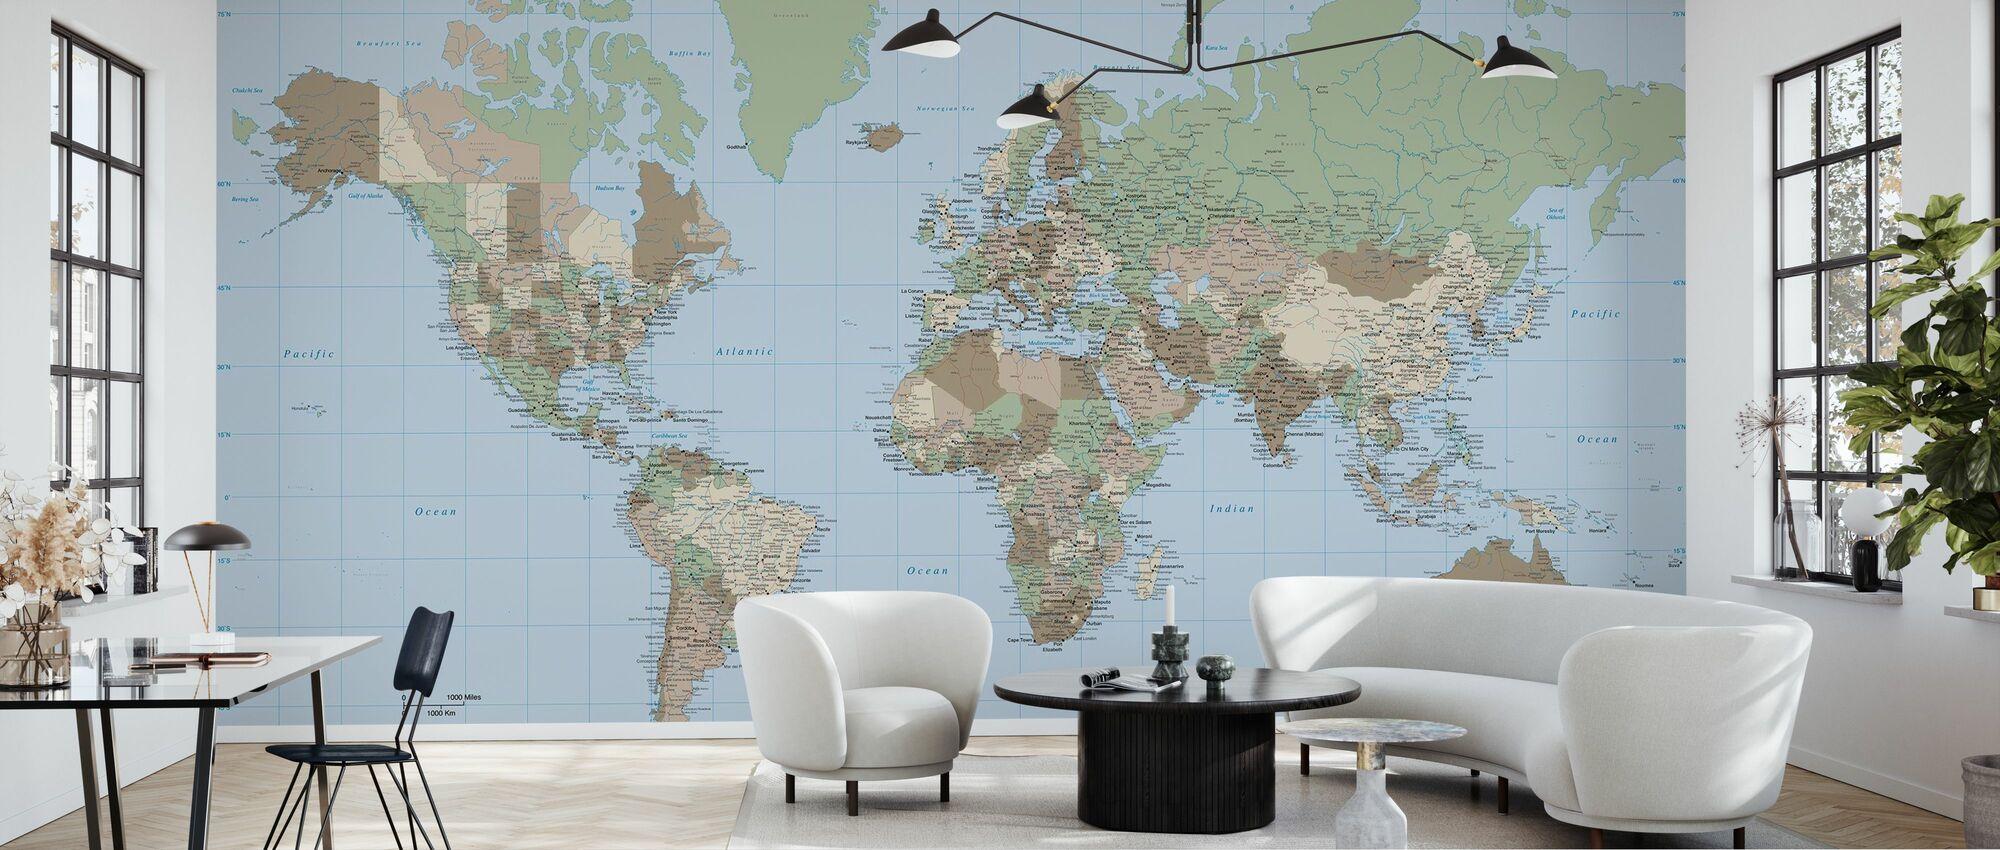 World Map Vintage - Wallpaper - Living Room